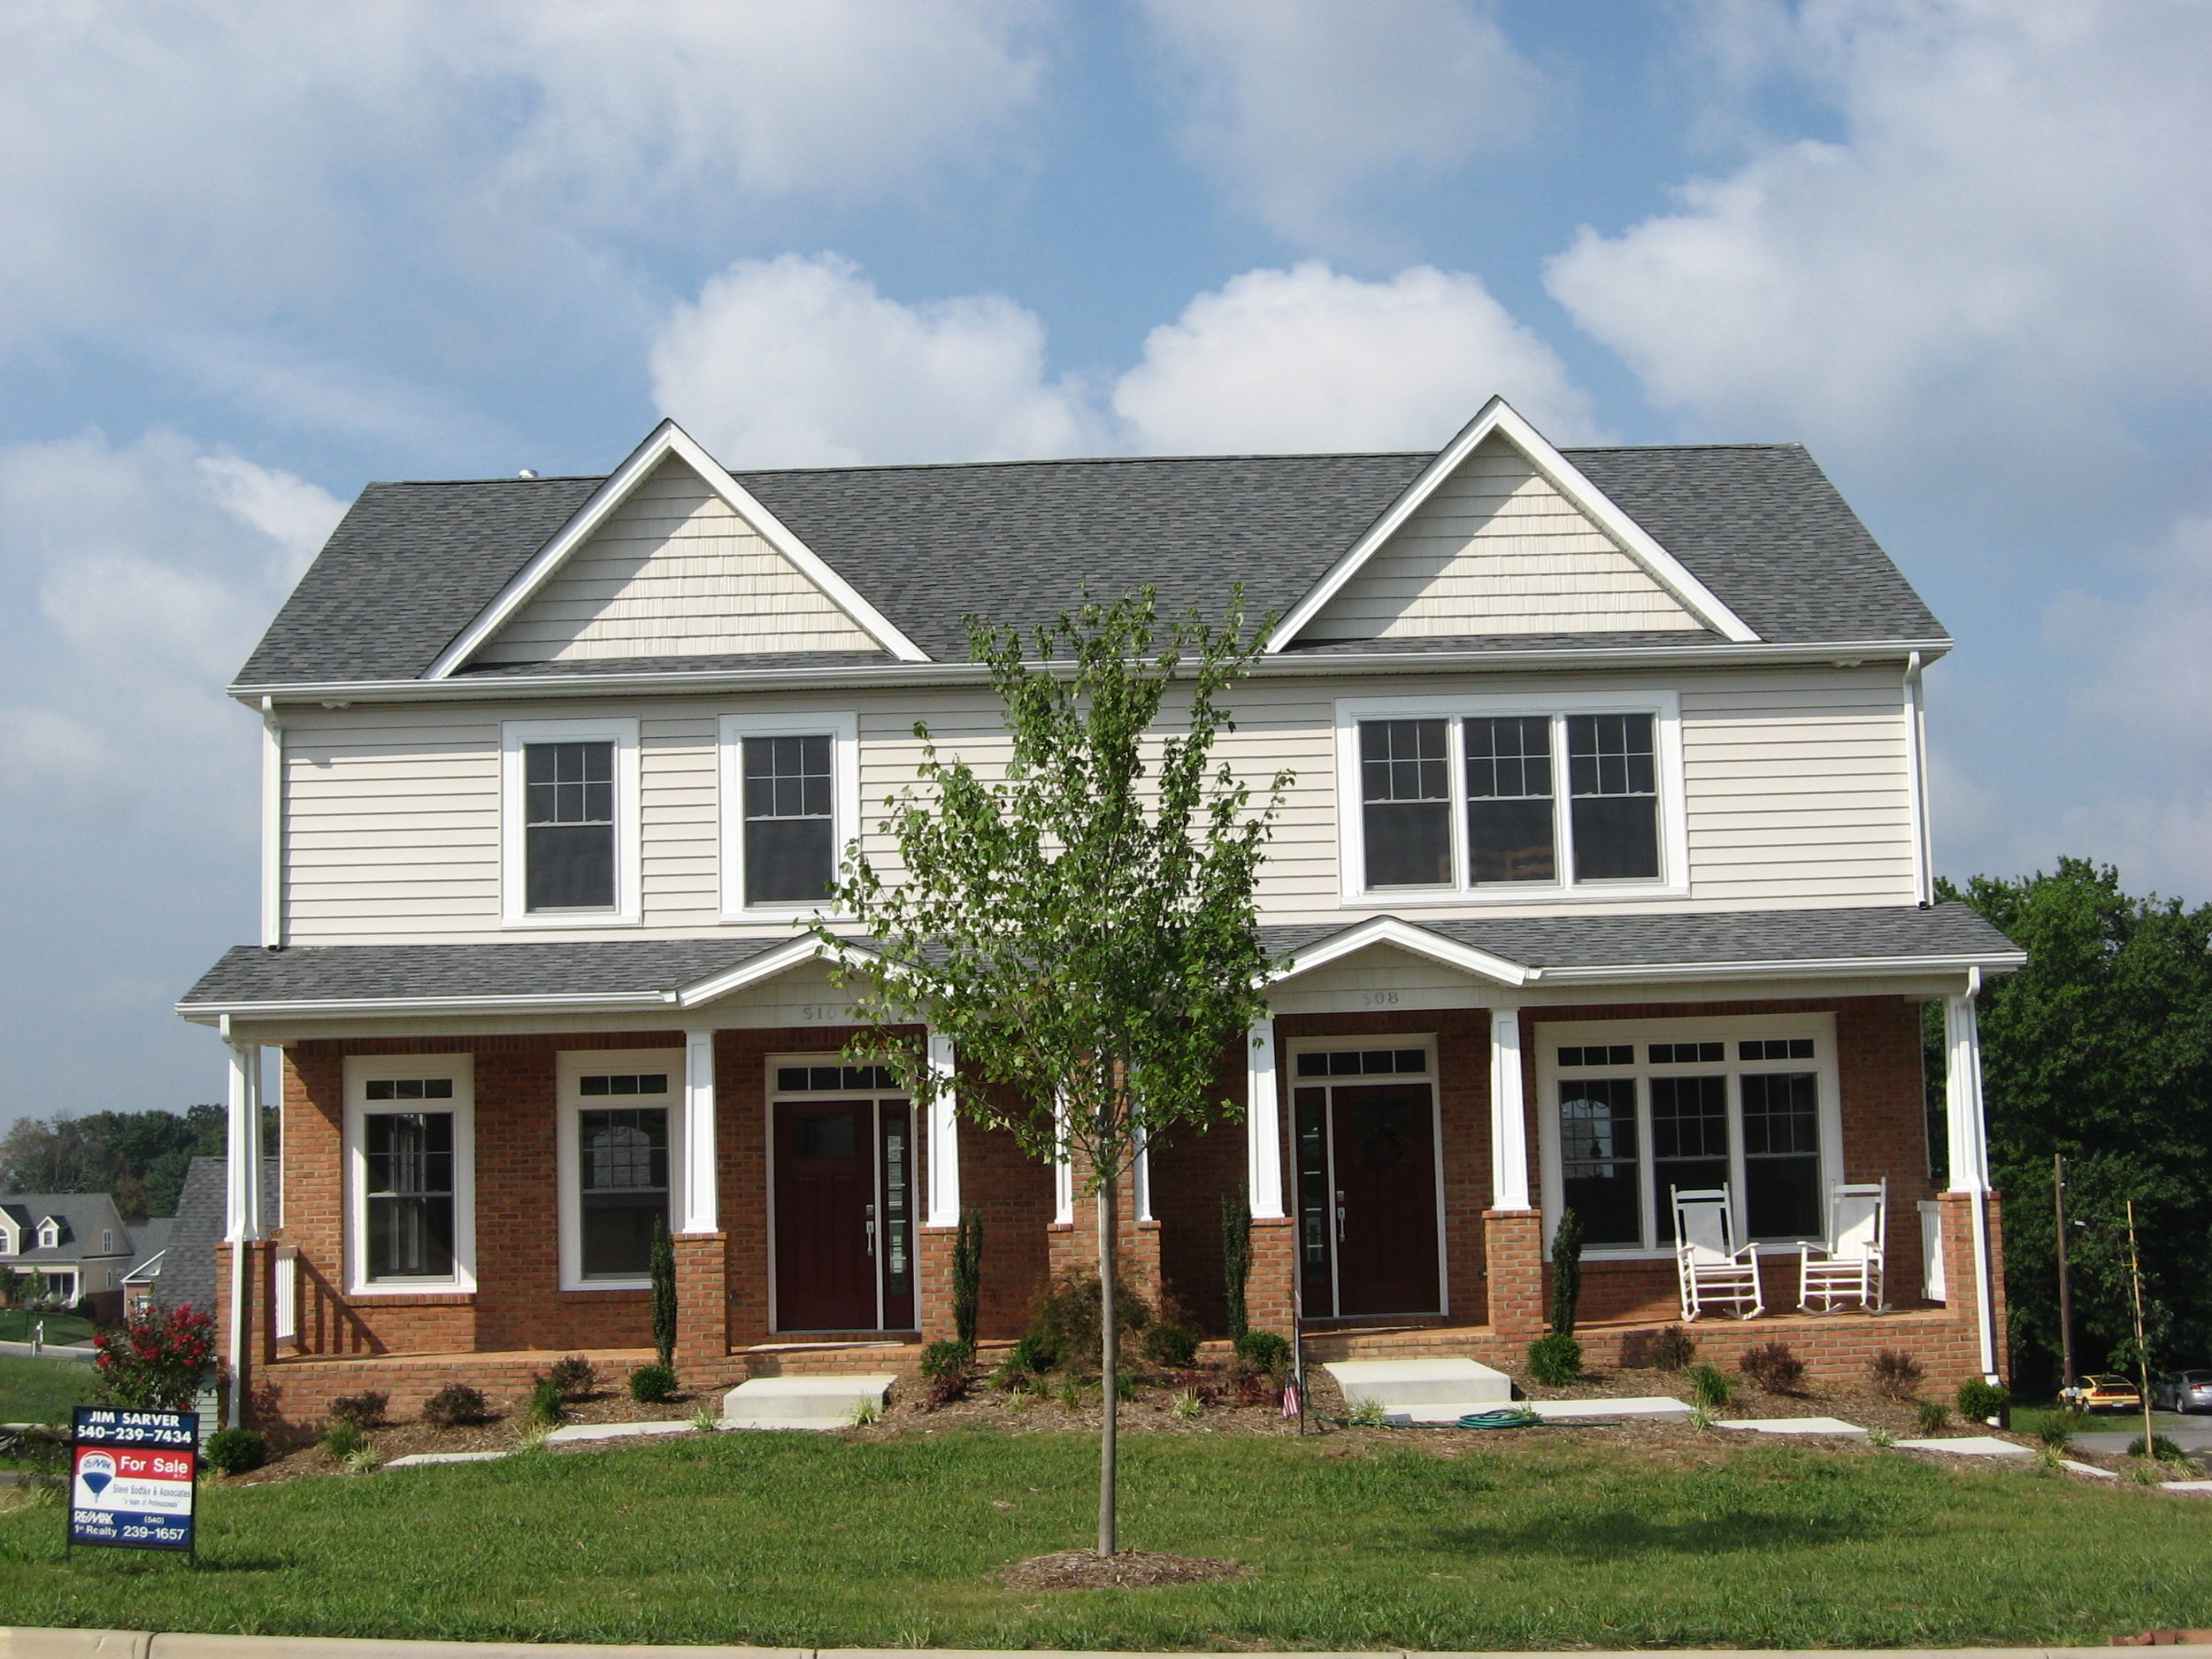 Duplexes 8-6-2010 (1).jpg